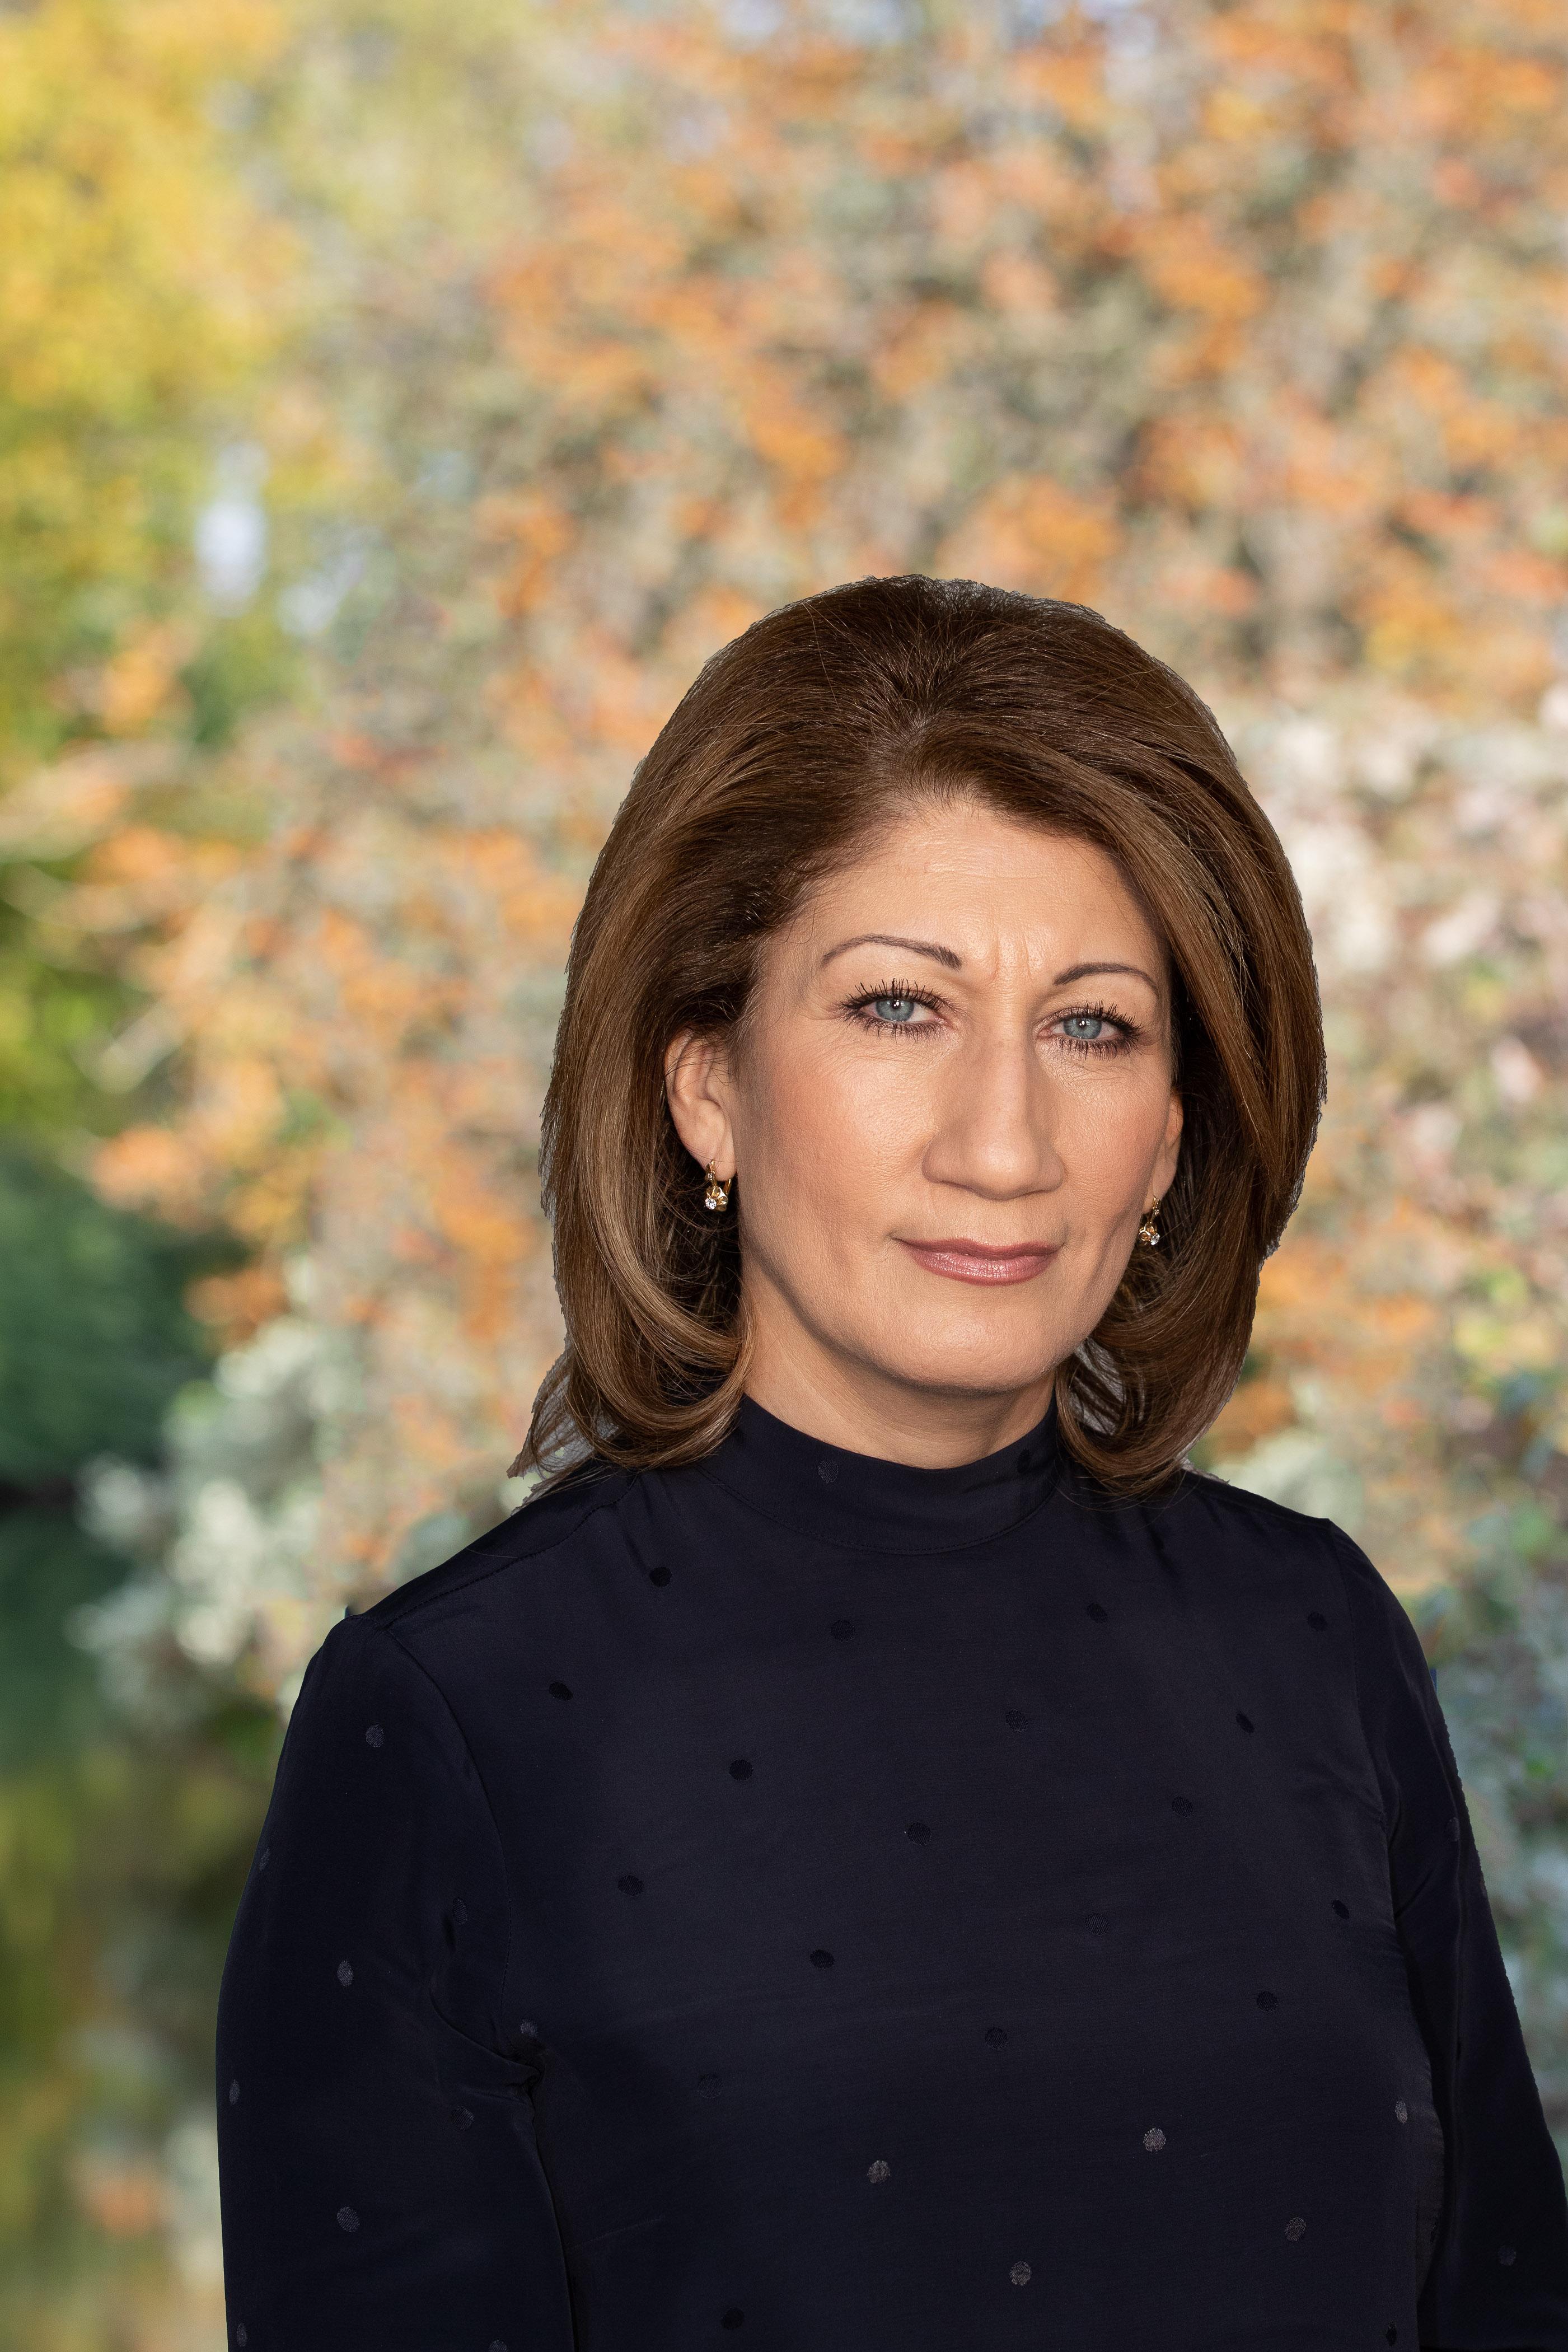 Susanna Karapetjan